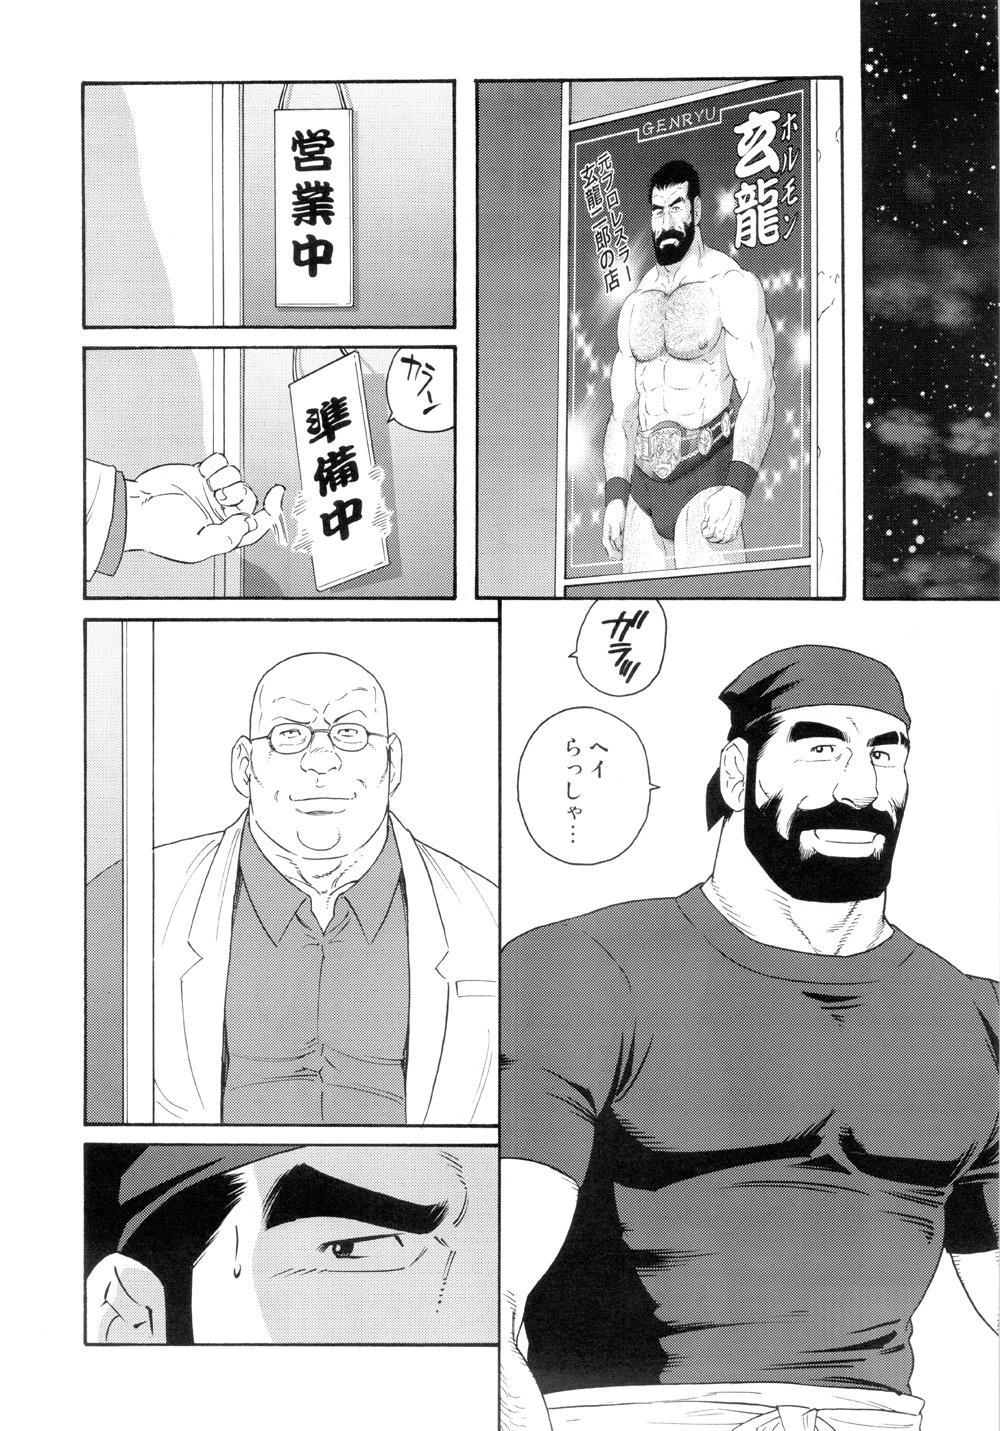 Genryu Chapter 1 1